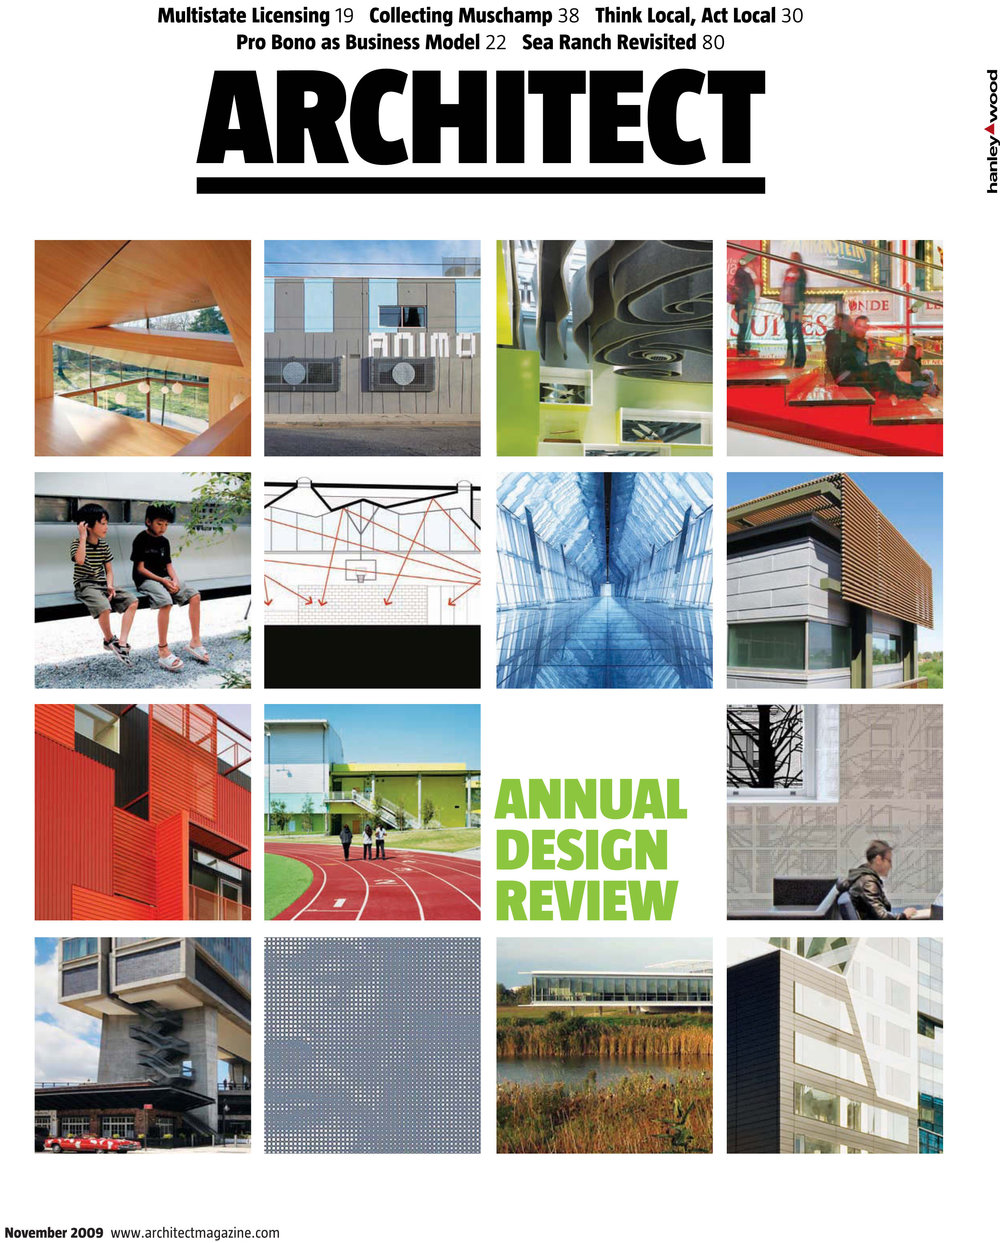 45381804-Architect-2009-11-1.jpg